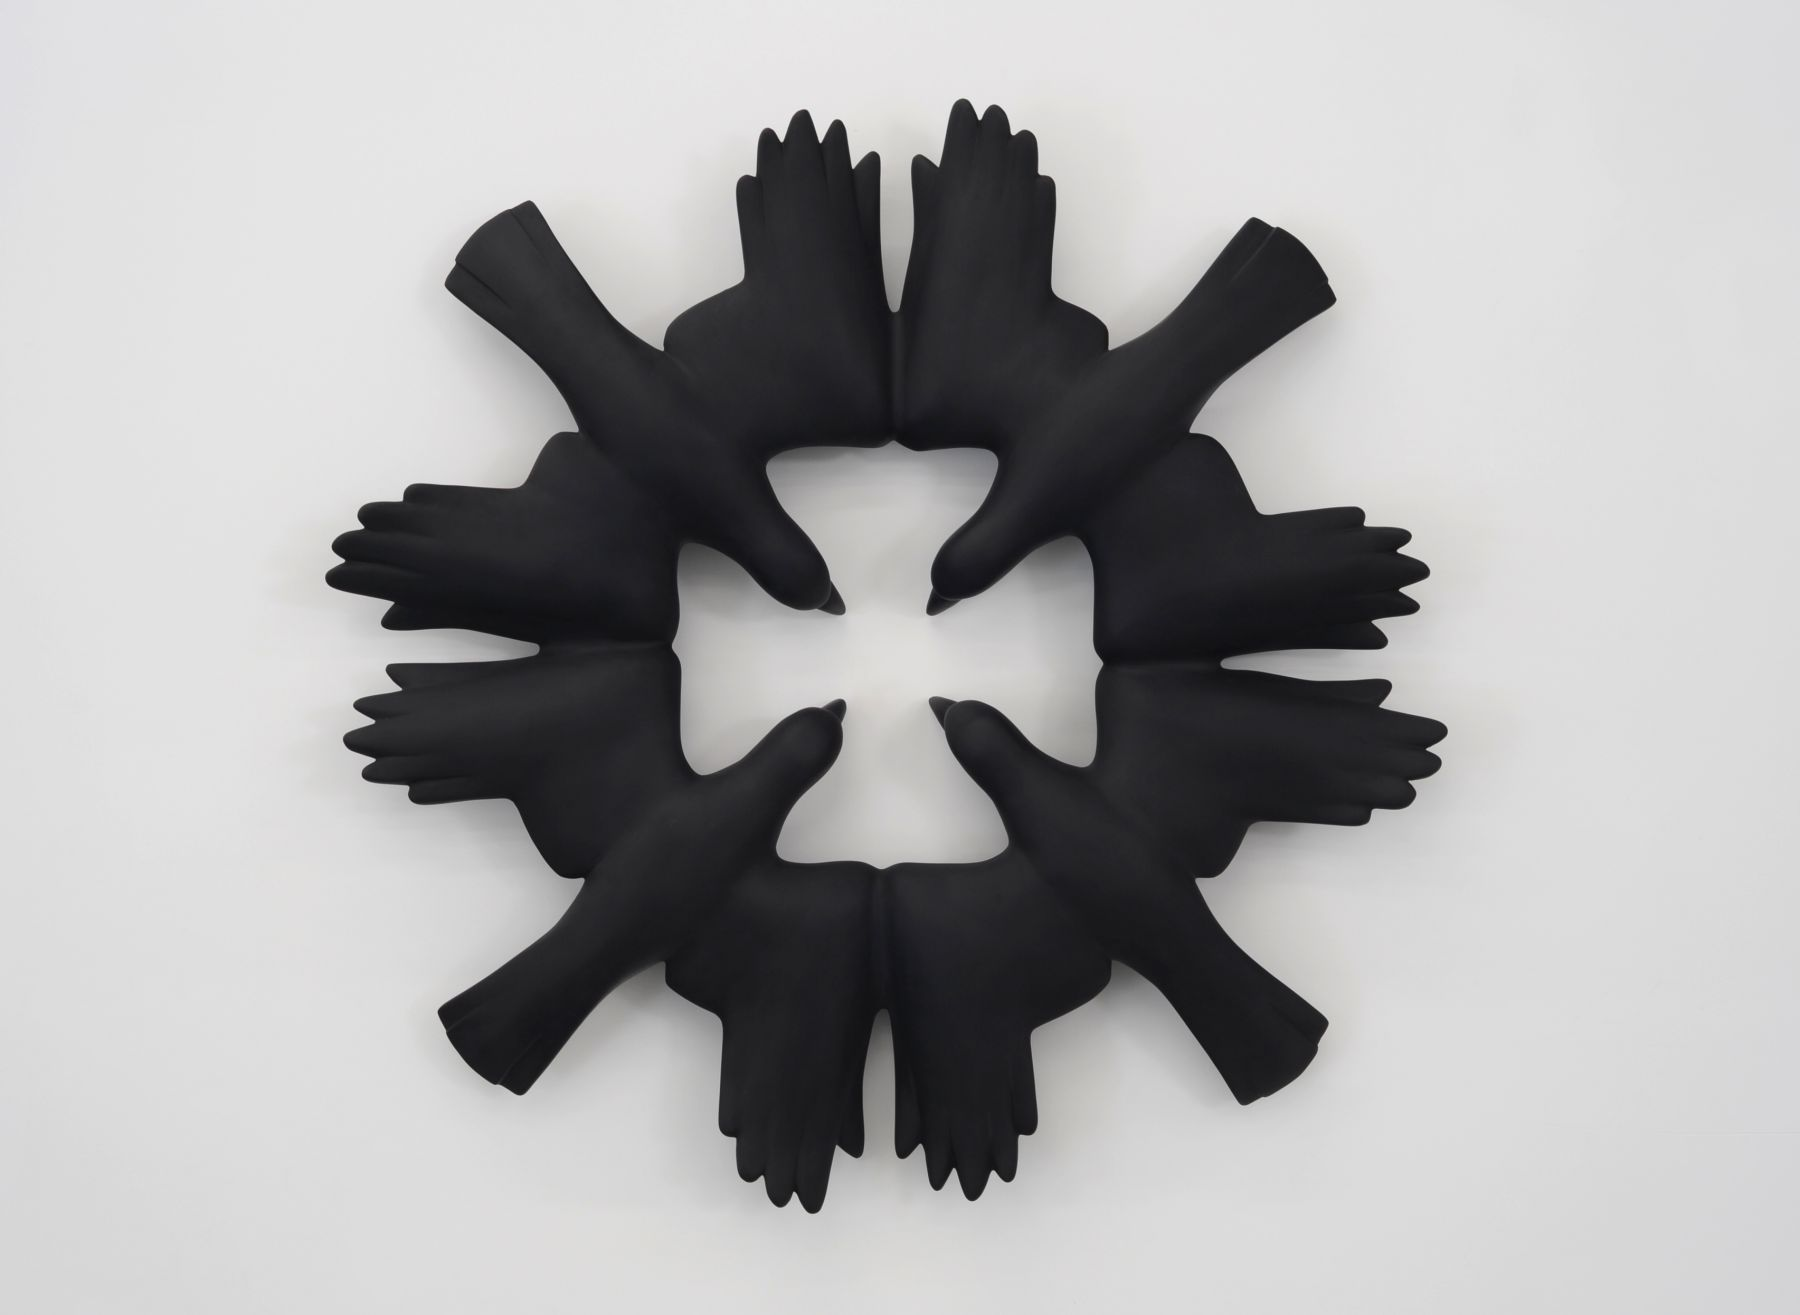 Kenny Hunter Roche Rooks jesmonite, paint, 47.5 x 47.5 x 6 inches sculpture